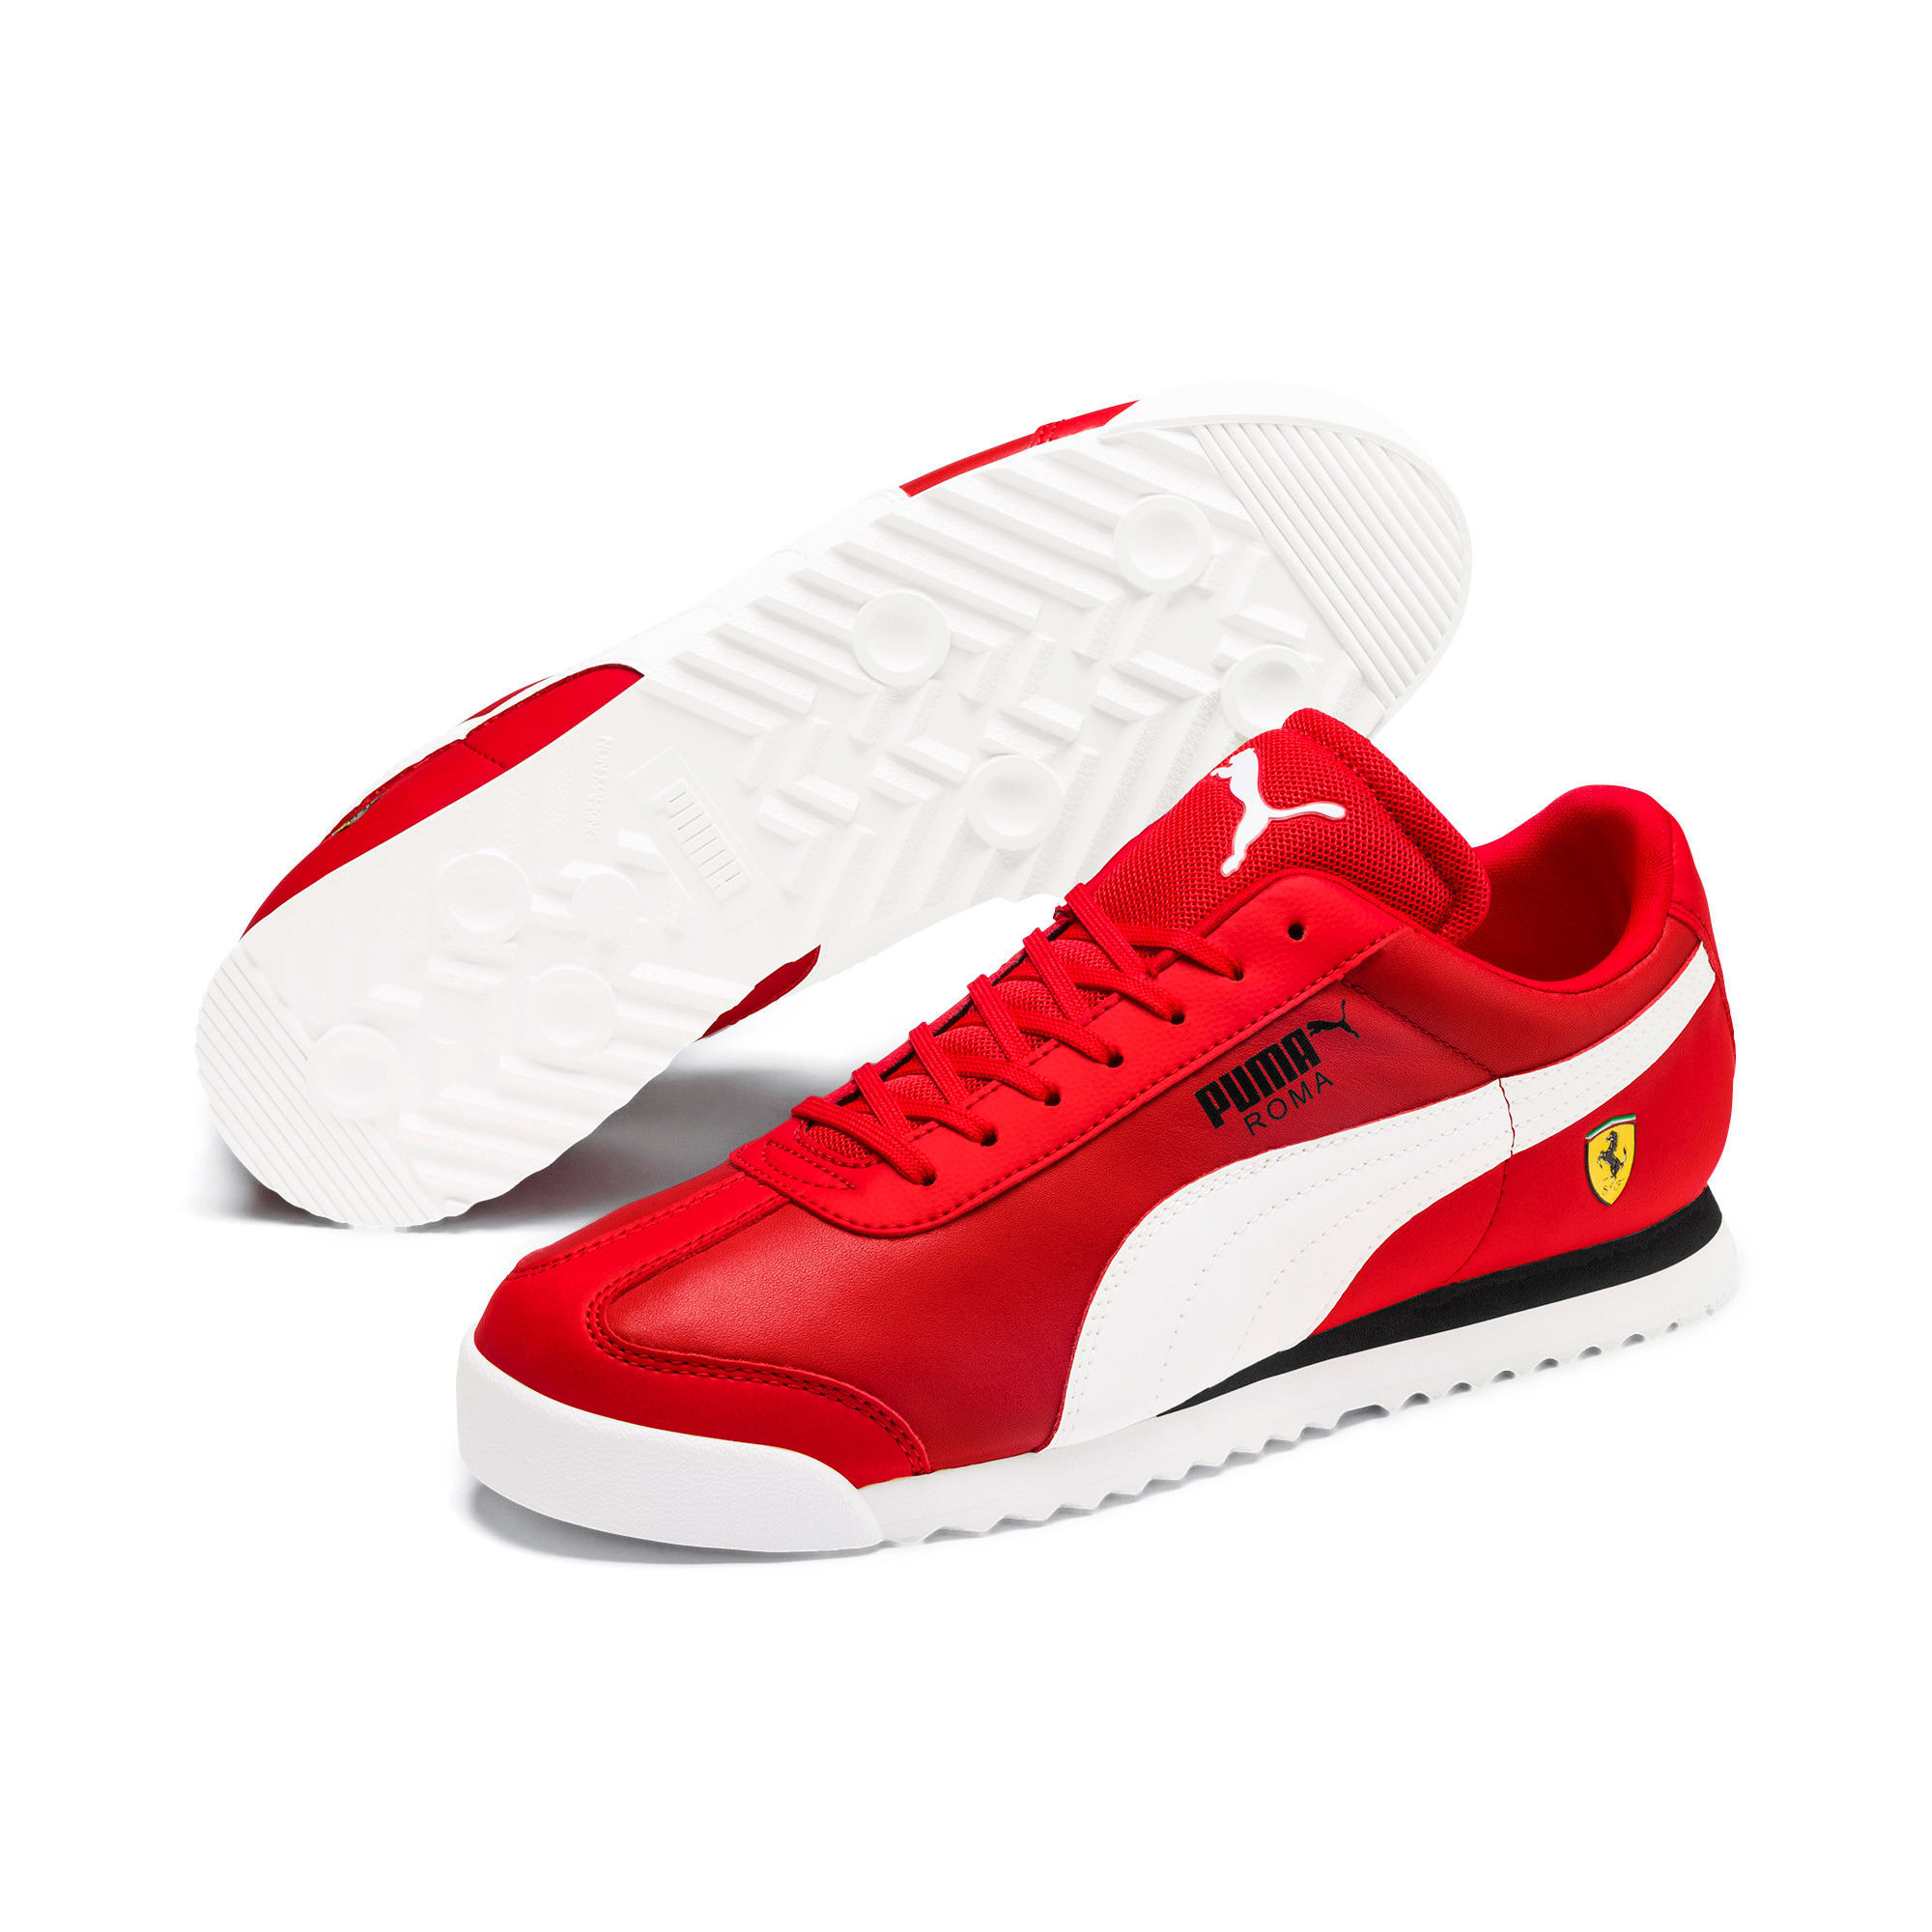 Thumbnail 3 of Scuderia Ferrari Roma Men's Sneakers, Rosso Corsa-White-Black, medium